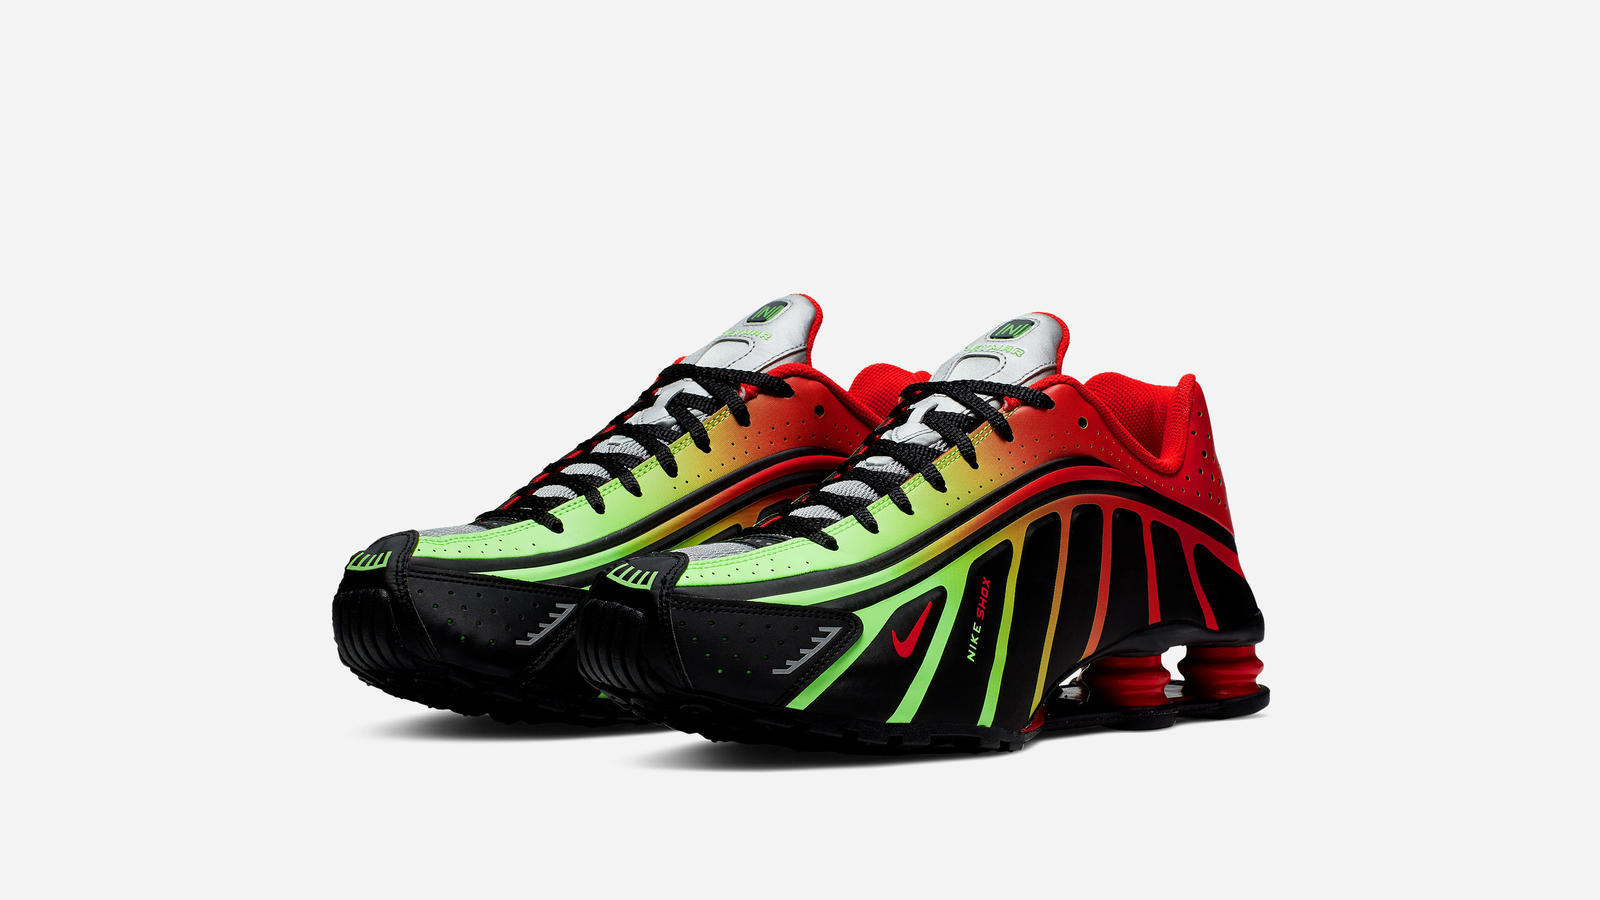 Nike Shox R4 Neymar JR Official Release Date 2